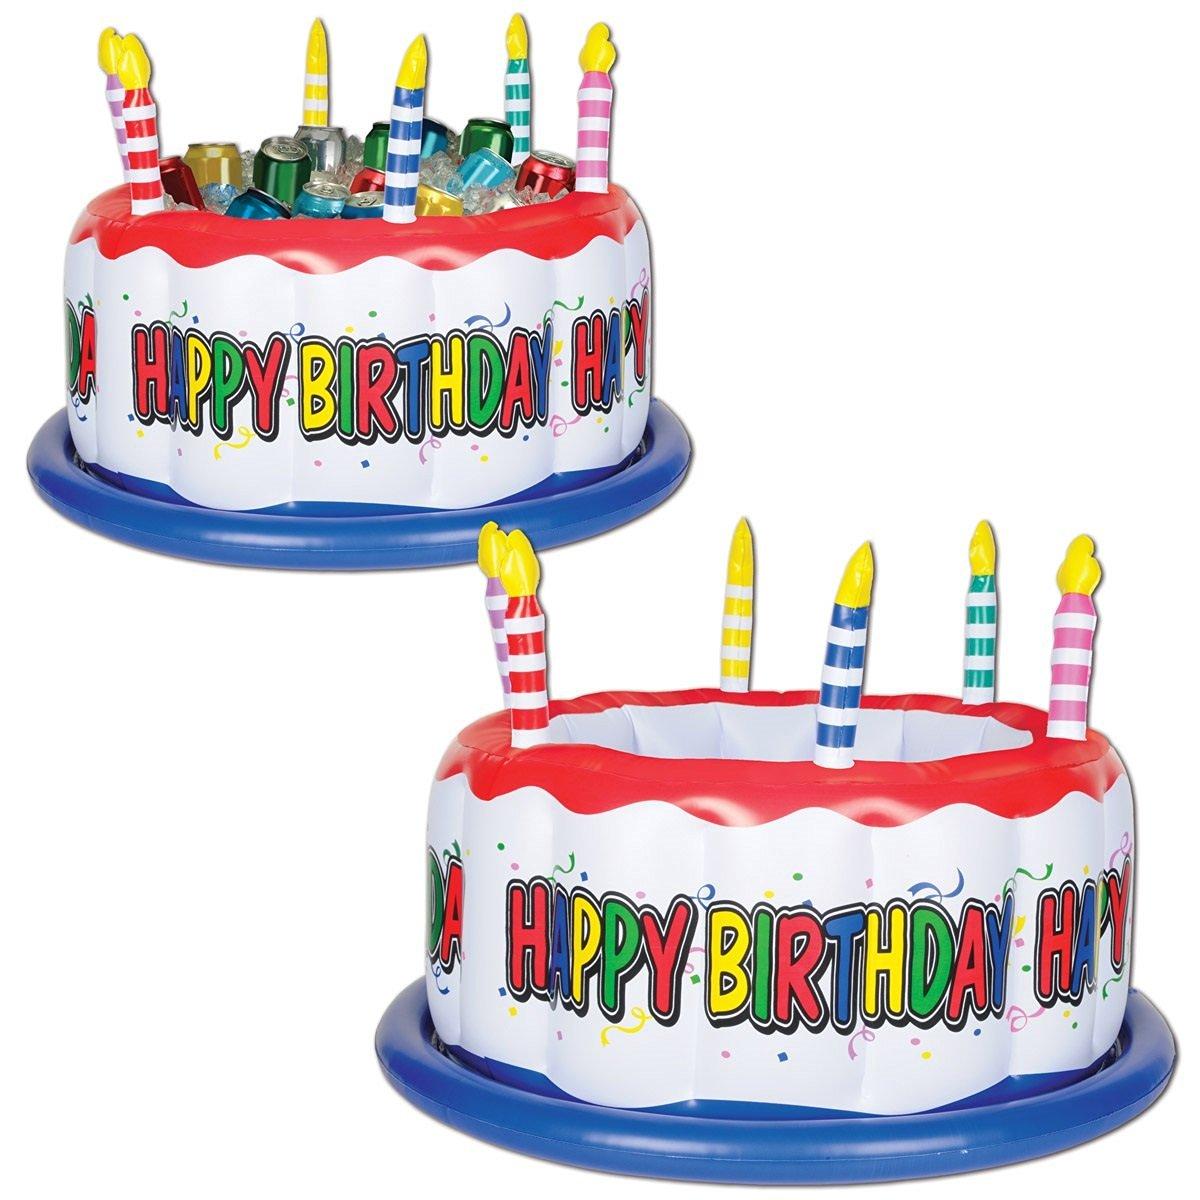 Happy Feet Birthday Party Decorations  from sc02.alicdn.com